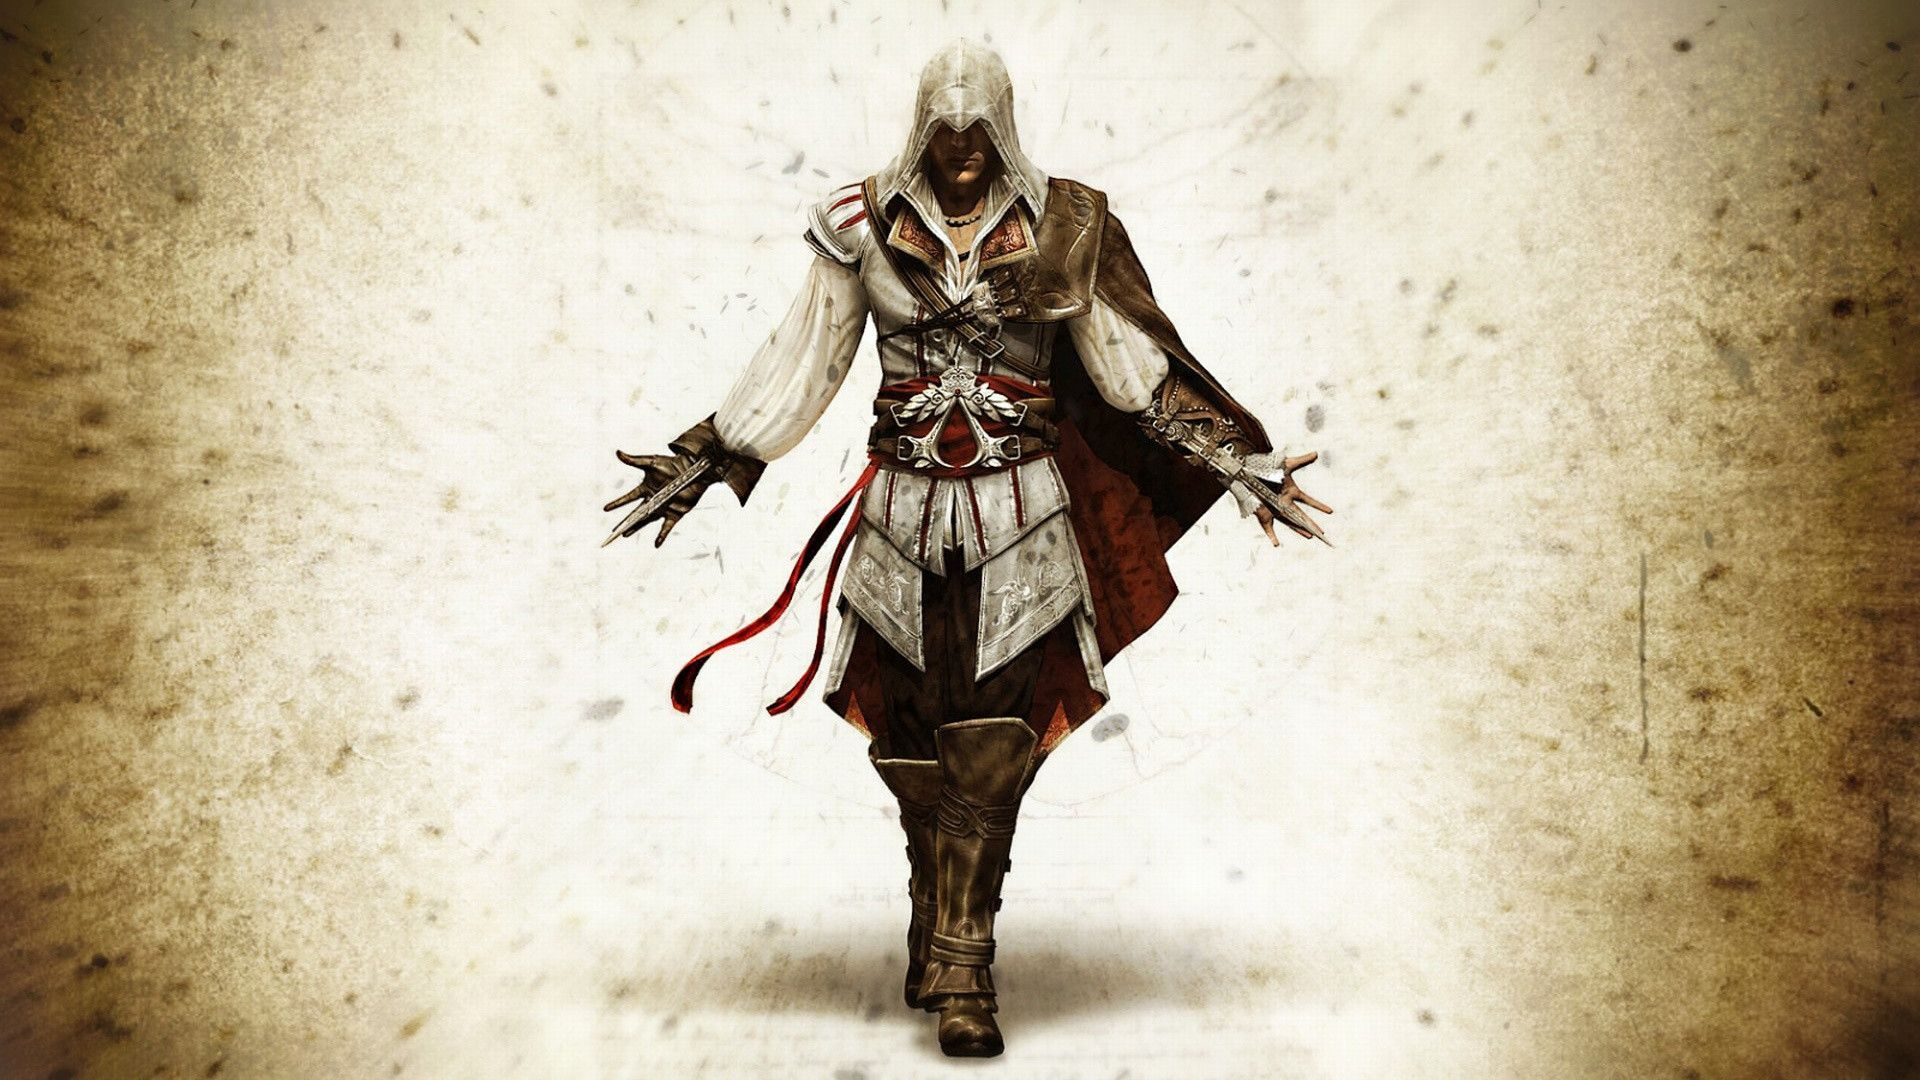 Assassins Creed Symbol Wallpapers Wallpaper 1920 1080 Assassin S Creed Wallpaper 27 Wallpape Assassin S Creed Wallpaper Assassin S Creed Hd Assassin S Creed